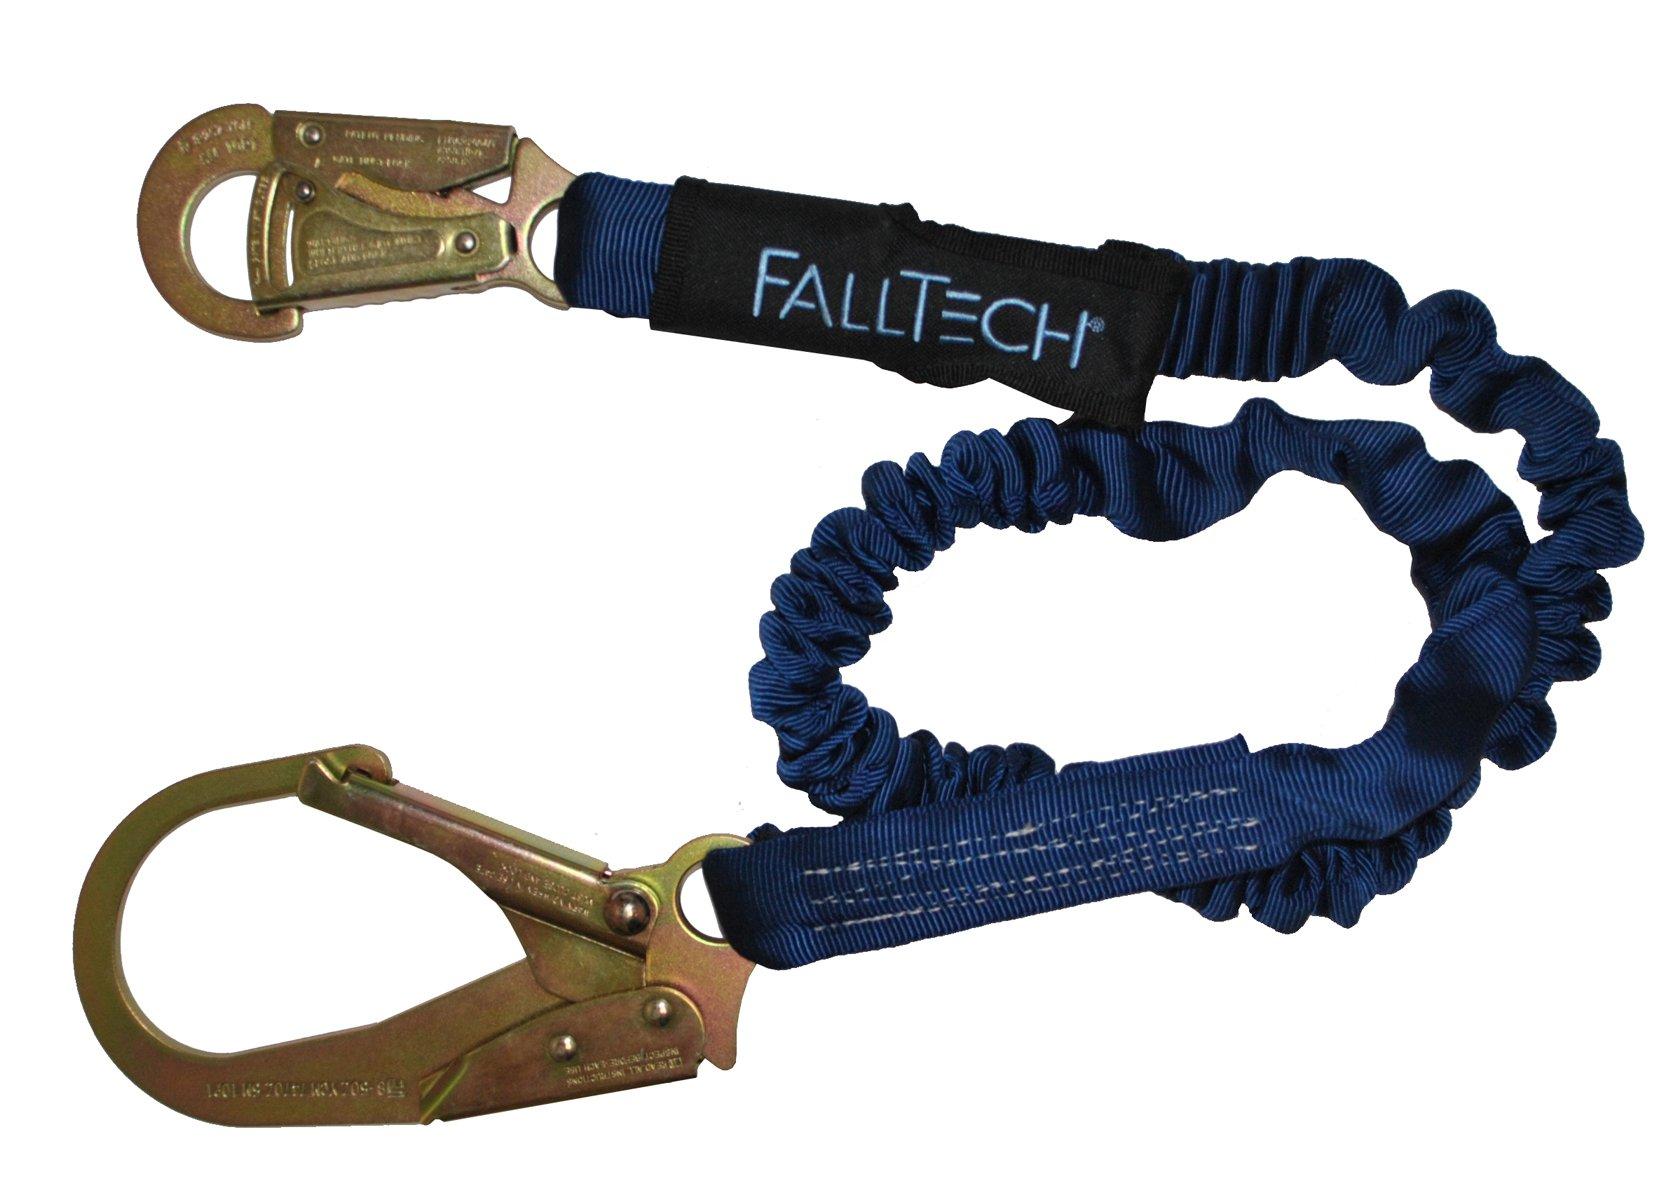 FallTech 82403 ElasTech 6-Foot Shock Absorbing Lanyard with Rebar Hook